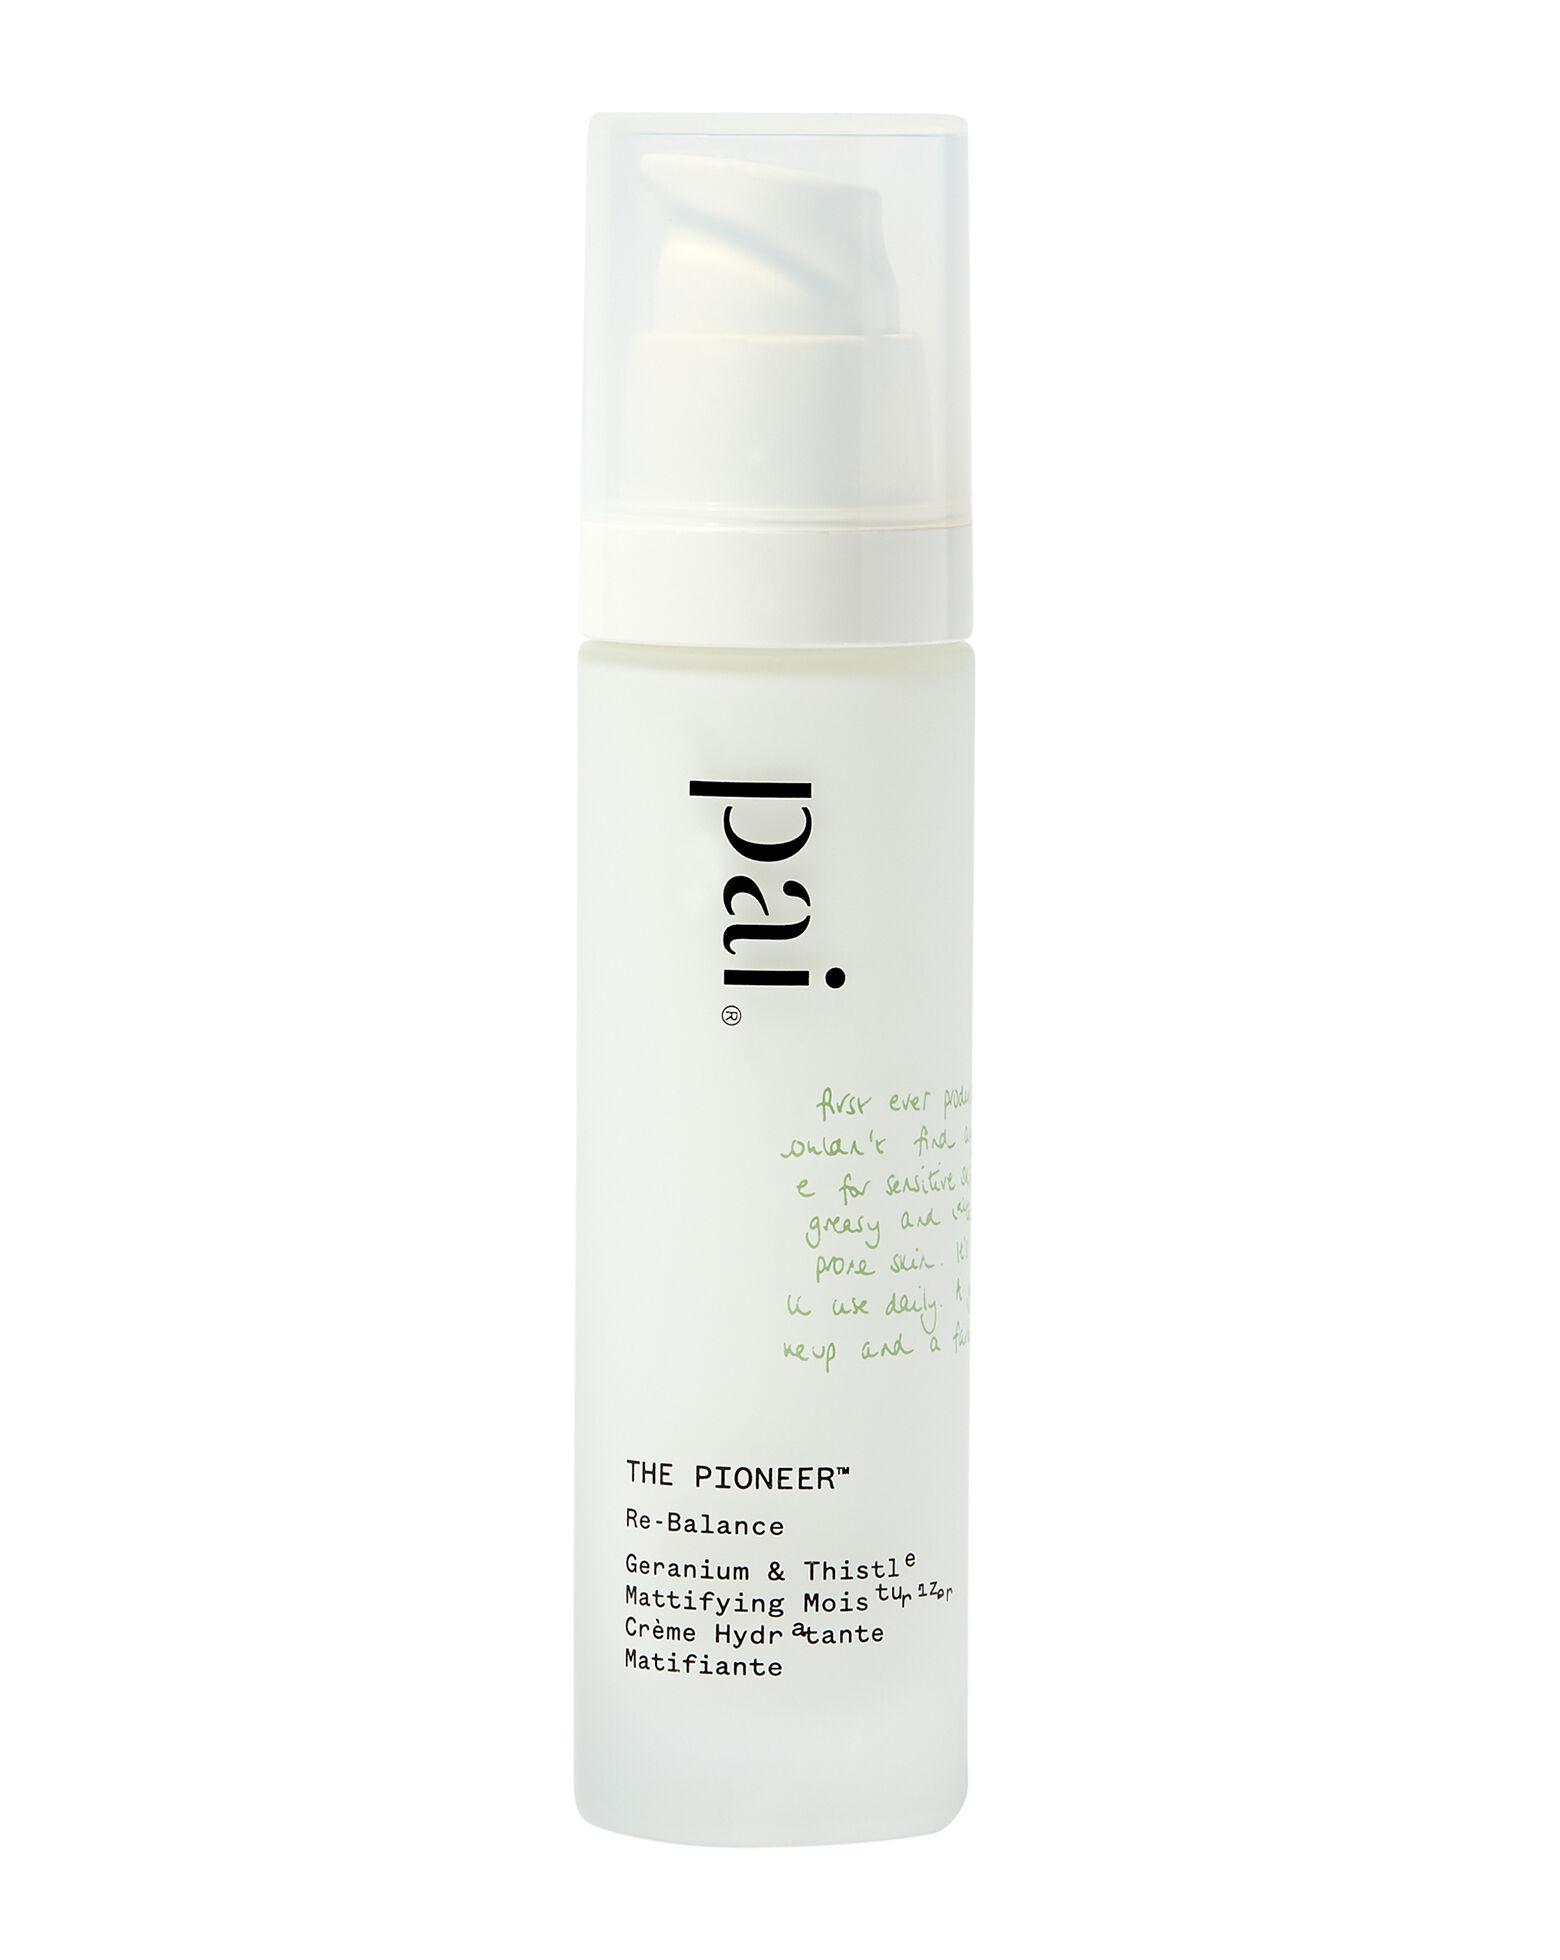 Pai Skincare - The Pioneer, Geranium & Thistle Mattifying Moisturizer